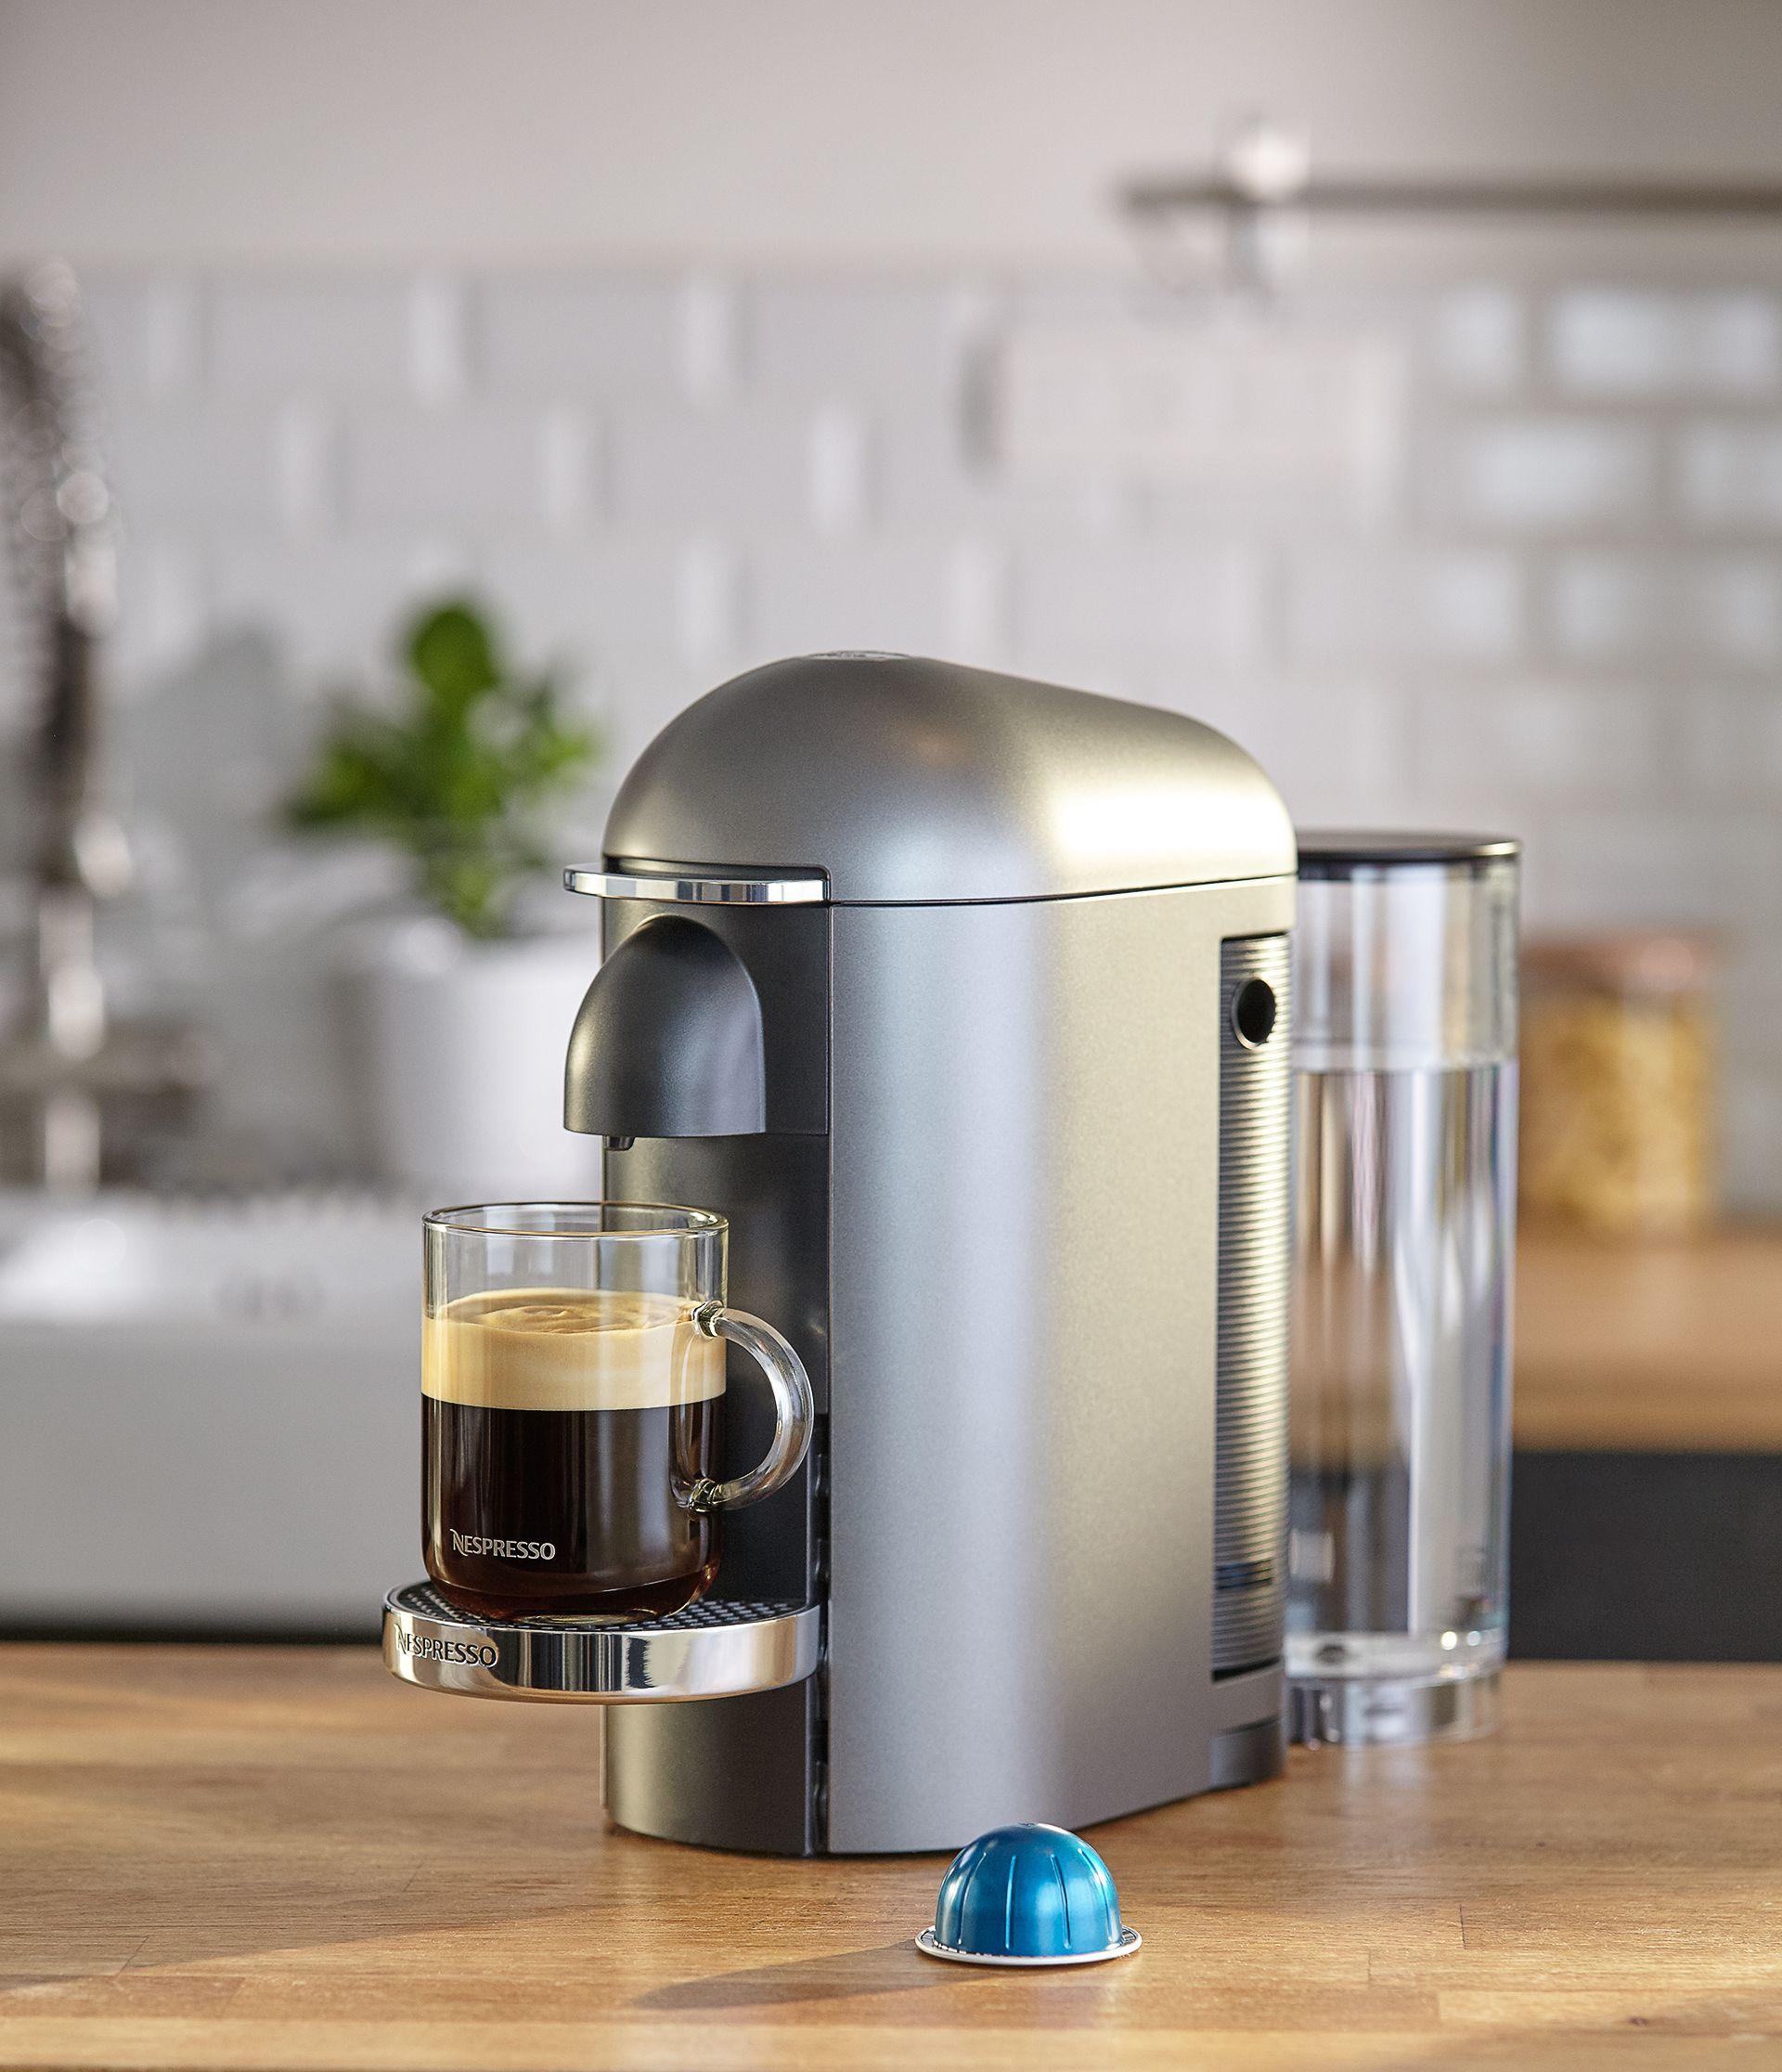 nespresso pr sente sa nouvelle machine caf vertuo objects design pinterest. Black Bedroom Furniture Sets. Home Design Ideas